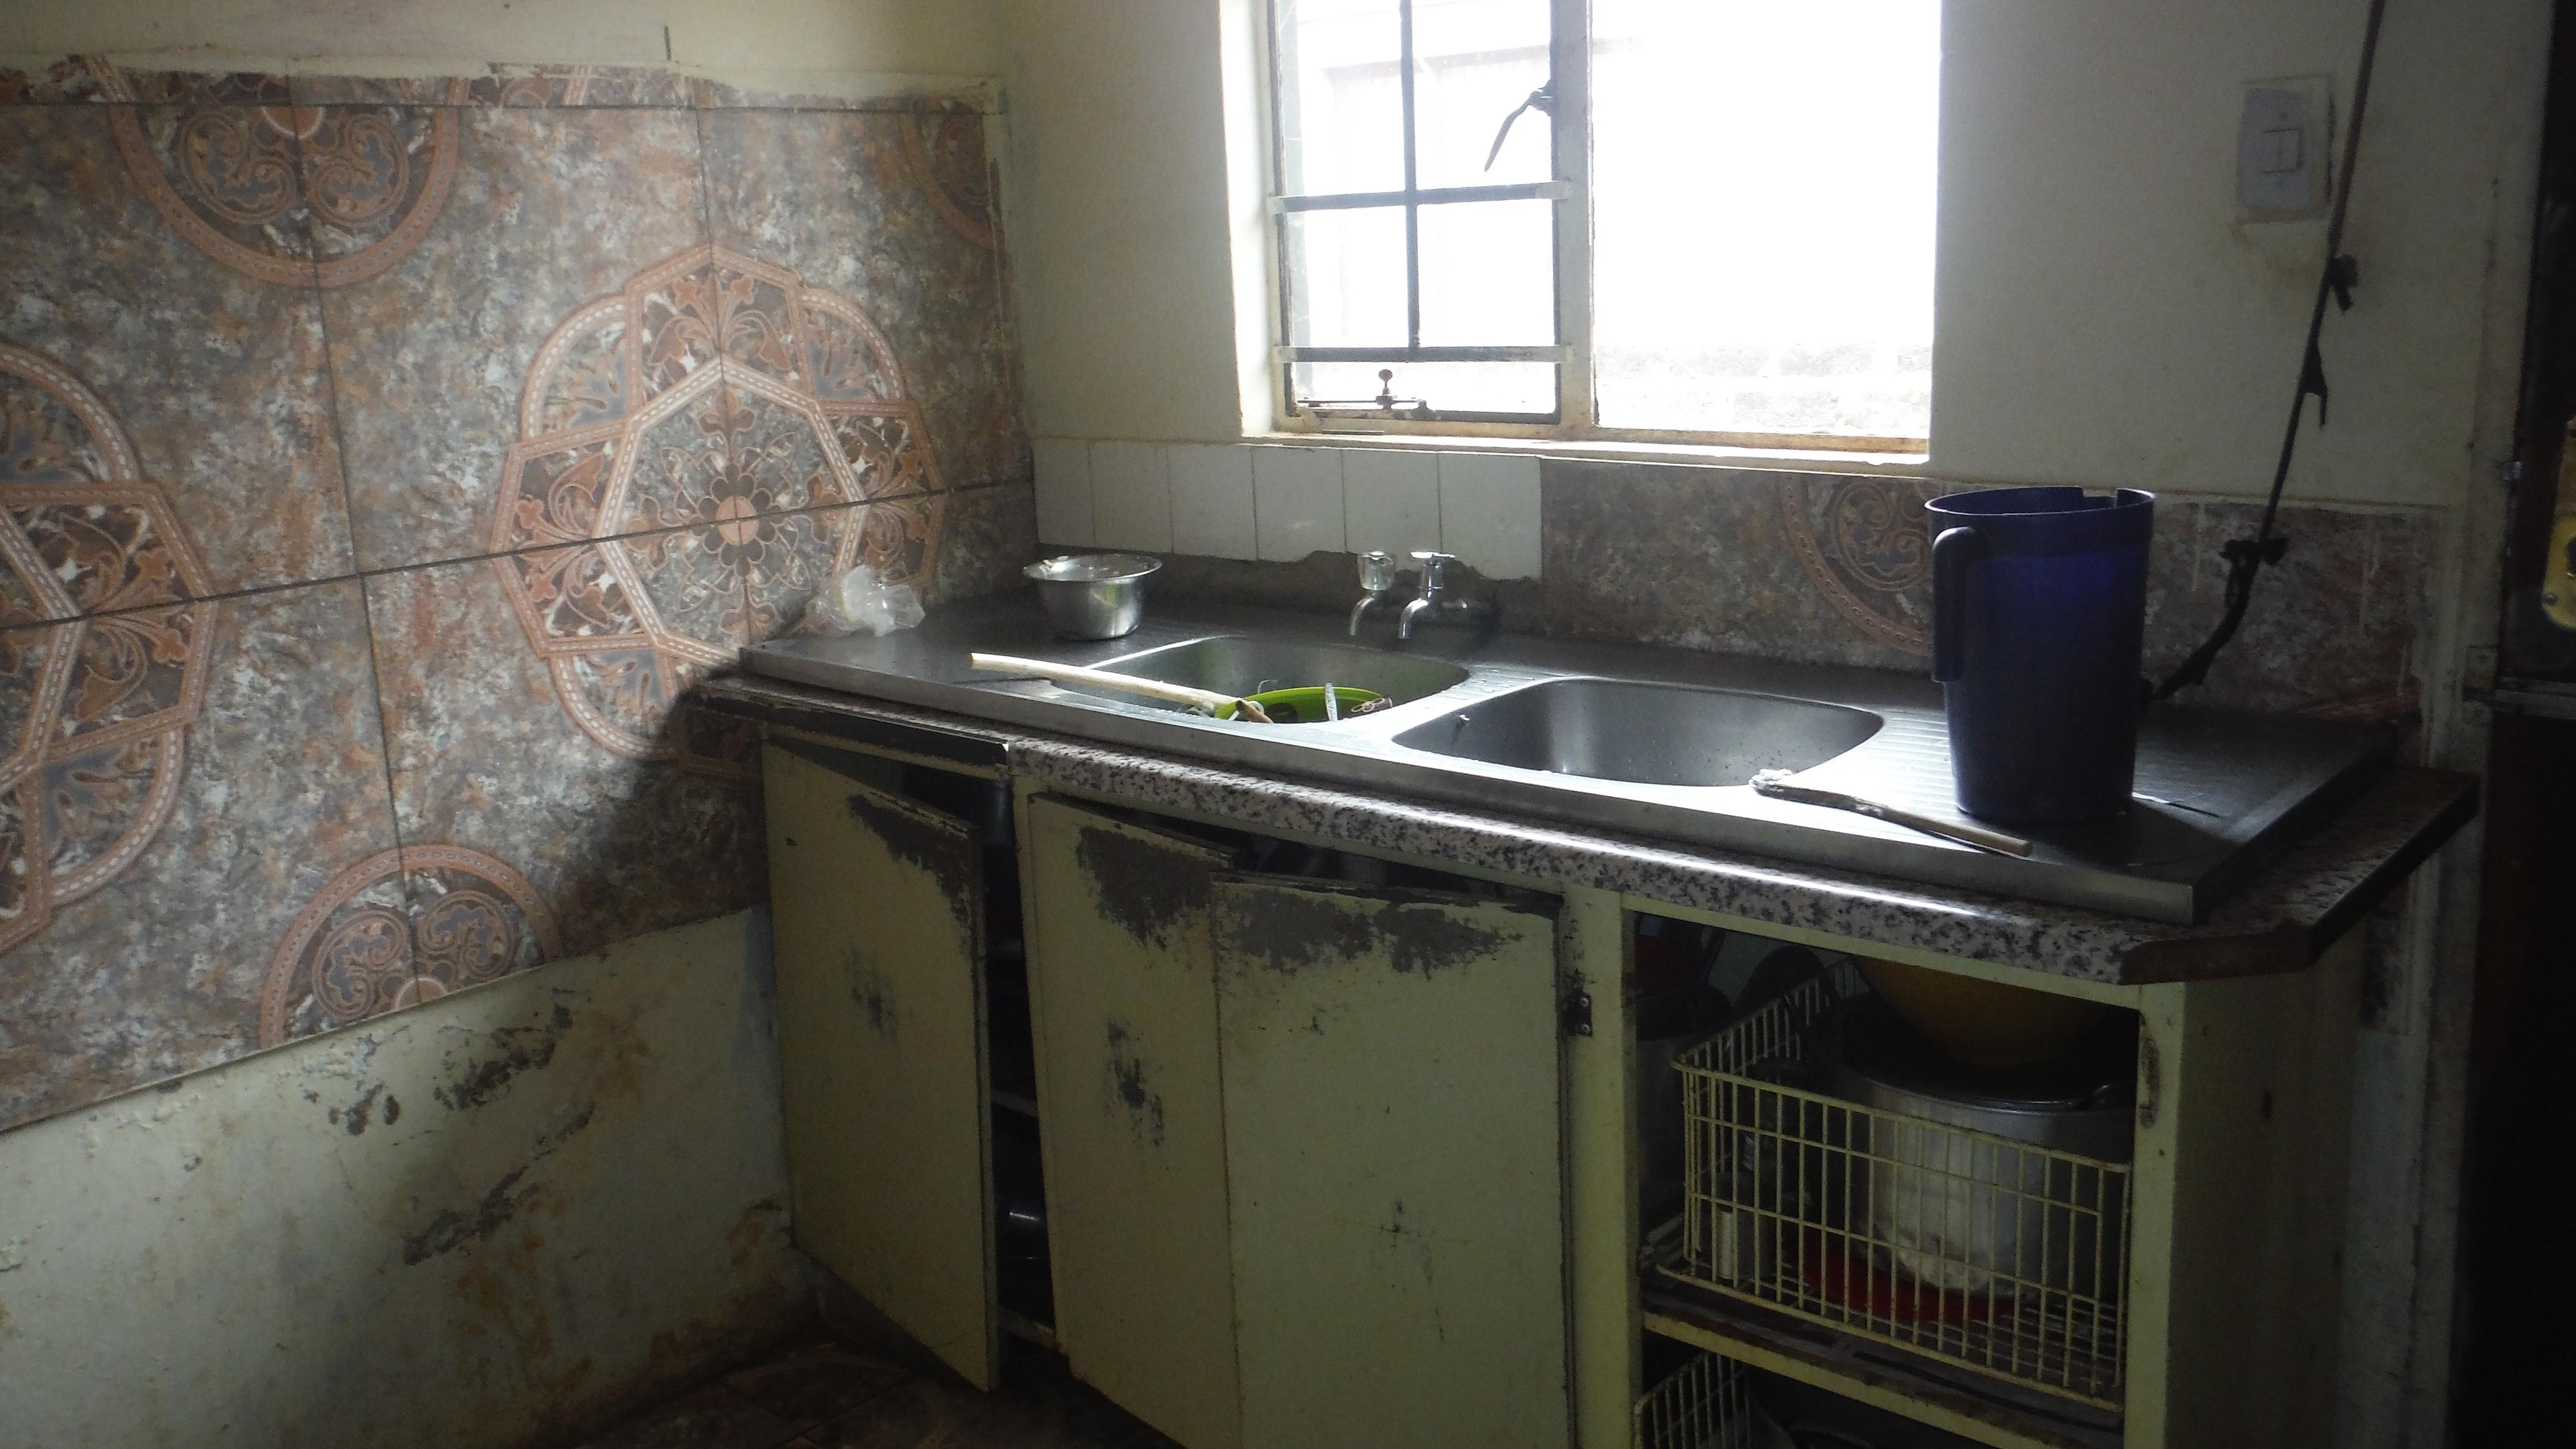 Kitchen after fire